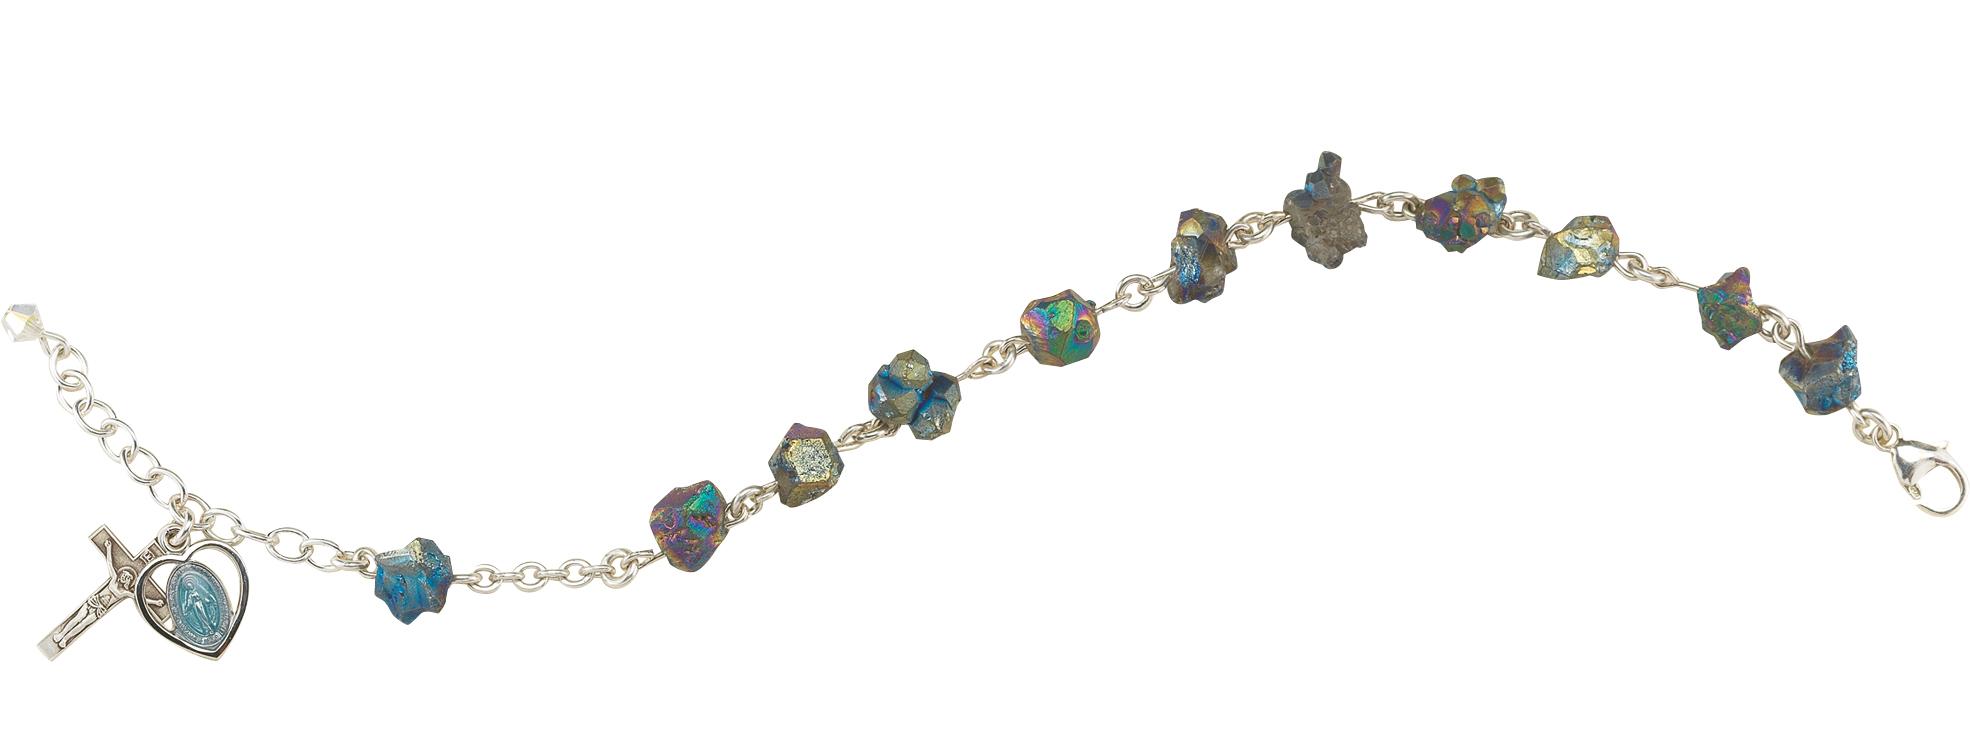 10-12mm Iris Nugget Rosary Bracelet